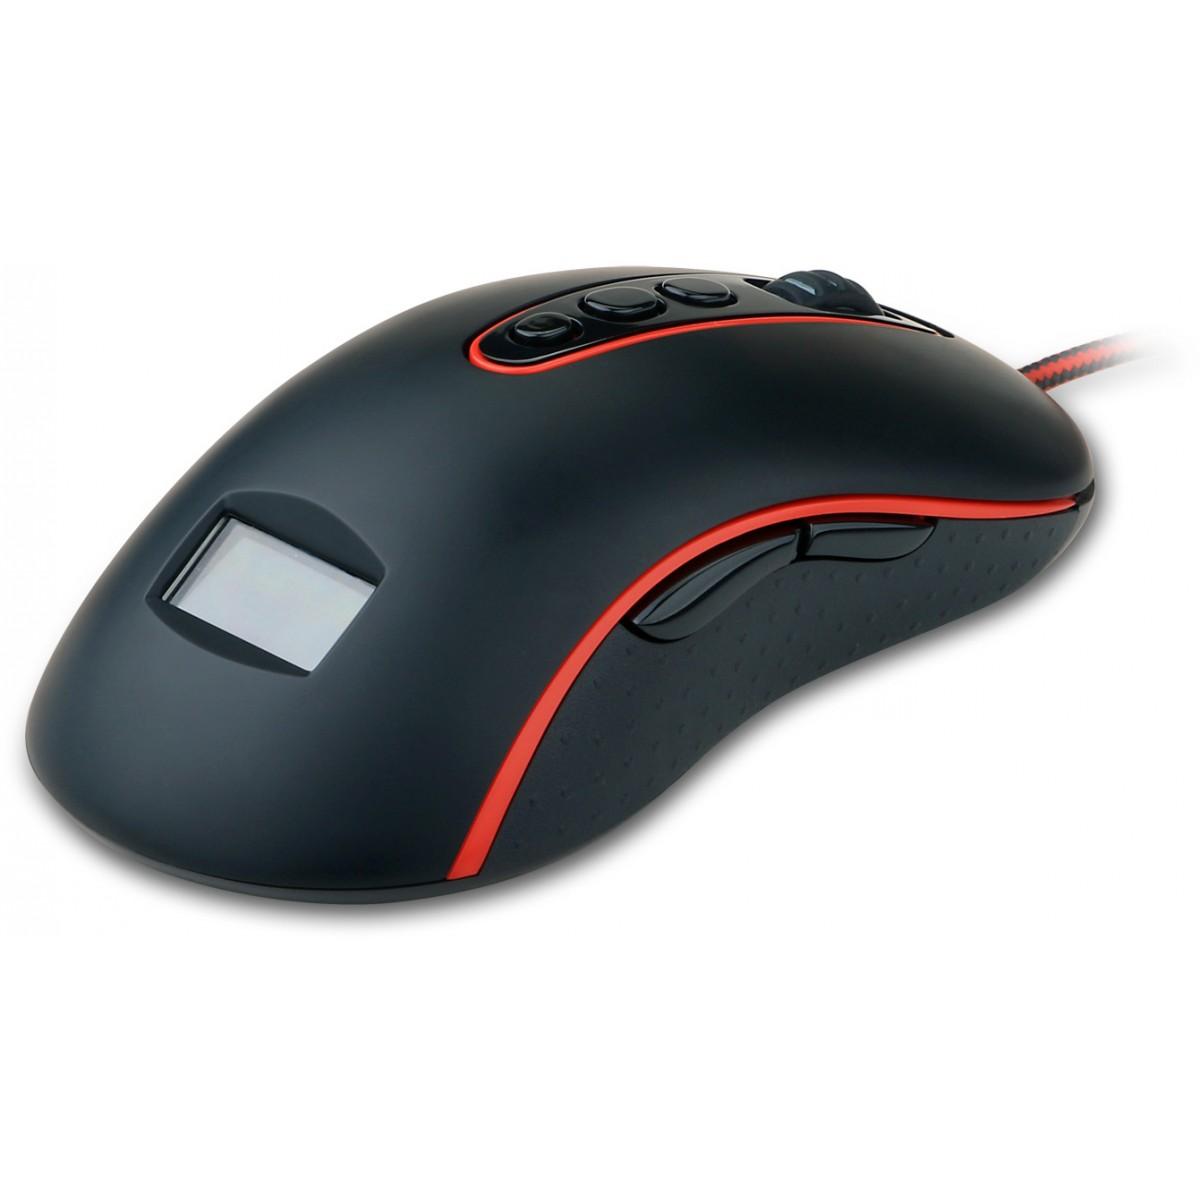 Mouse Gamer Redragon Mars M906, 4000 DPI, 5 Botões Programáveis, Black/Red